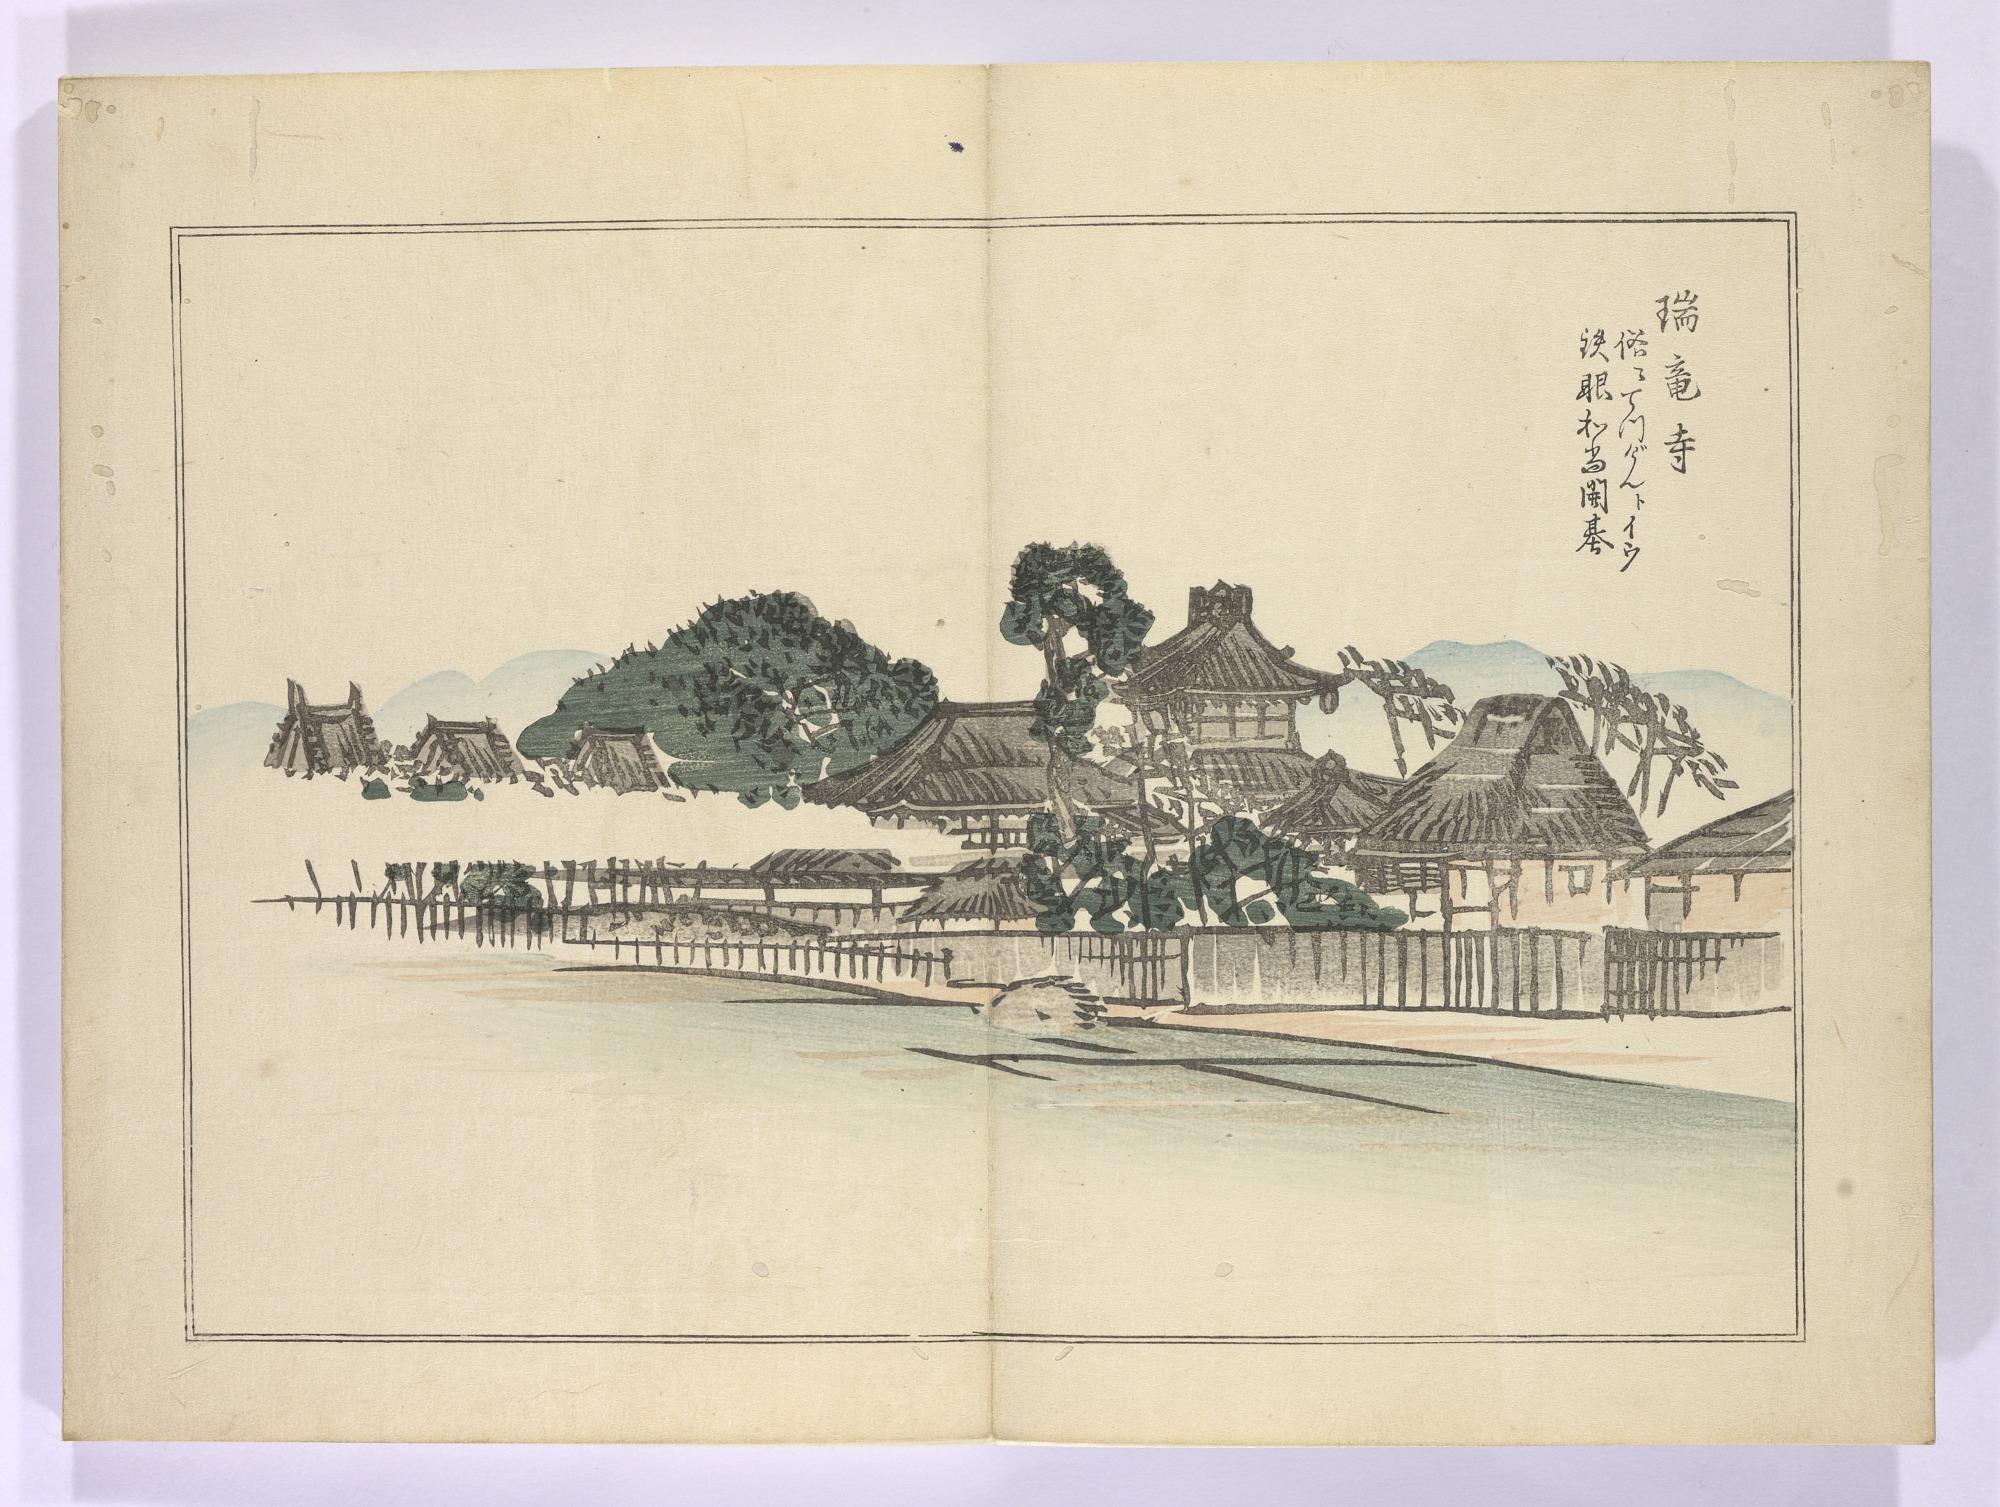 Kashin shōchi shō shohen